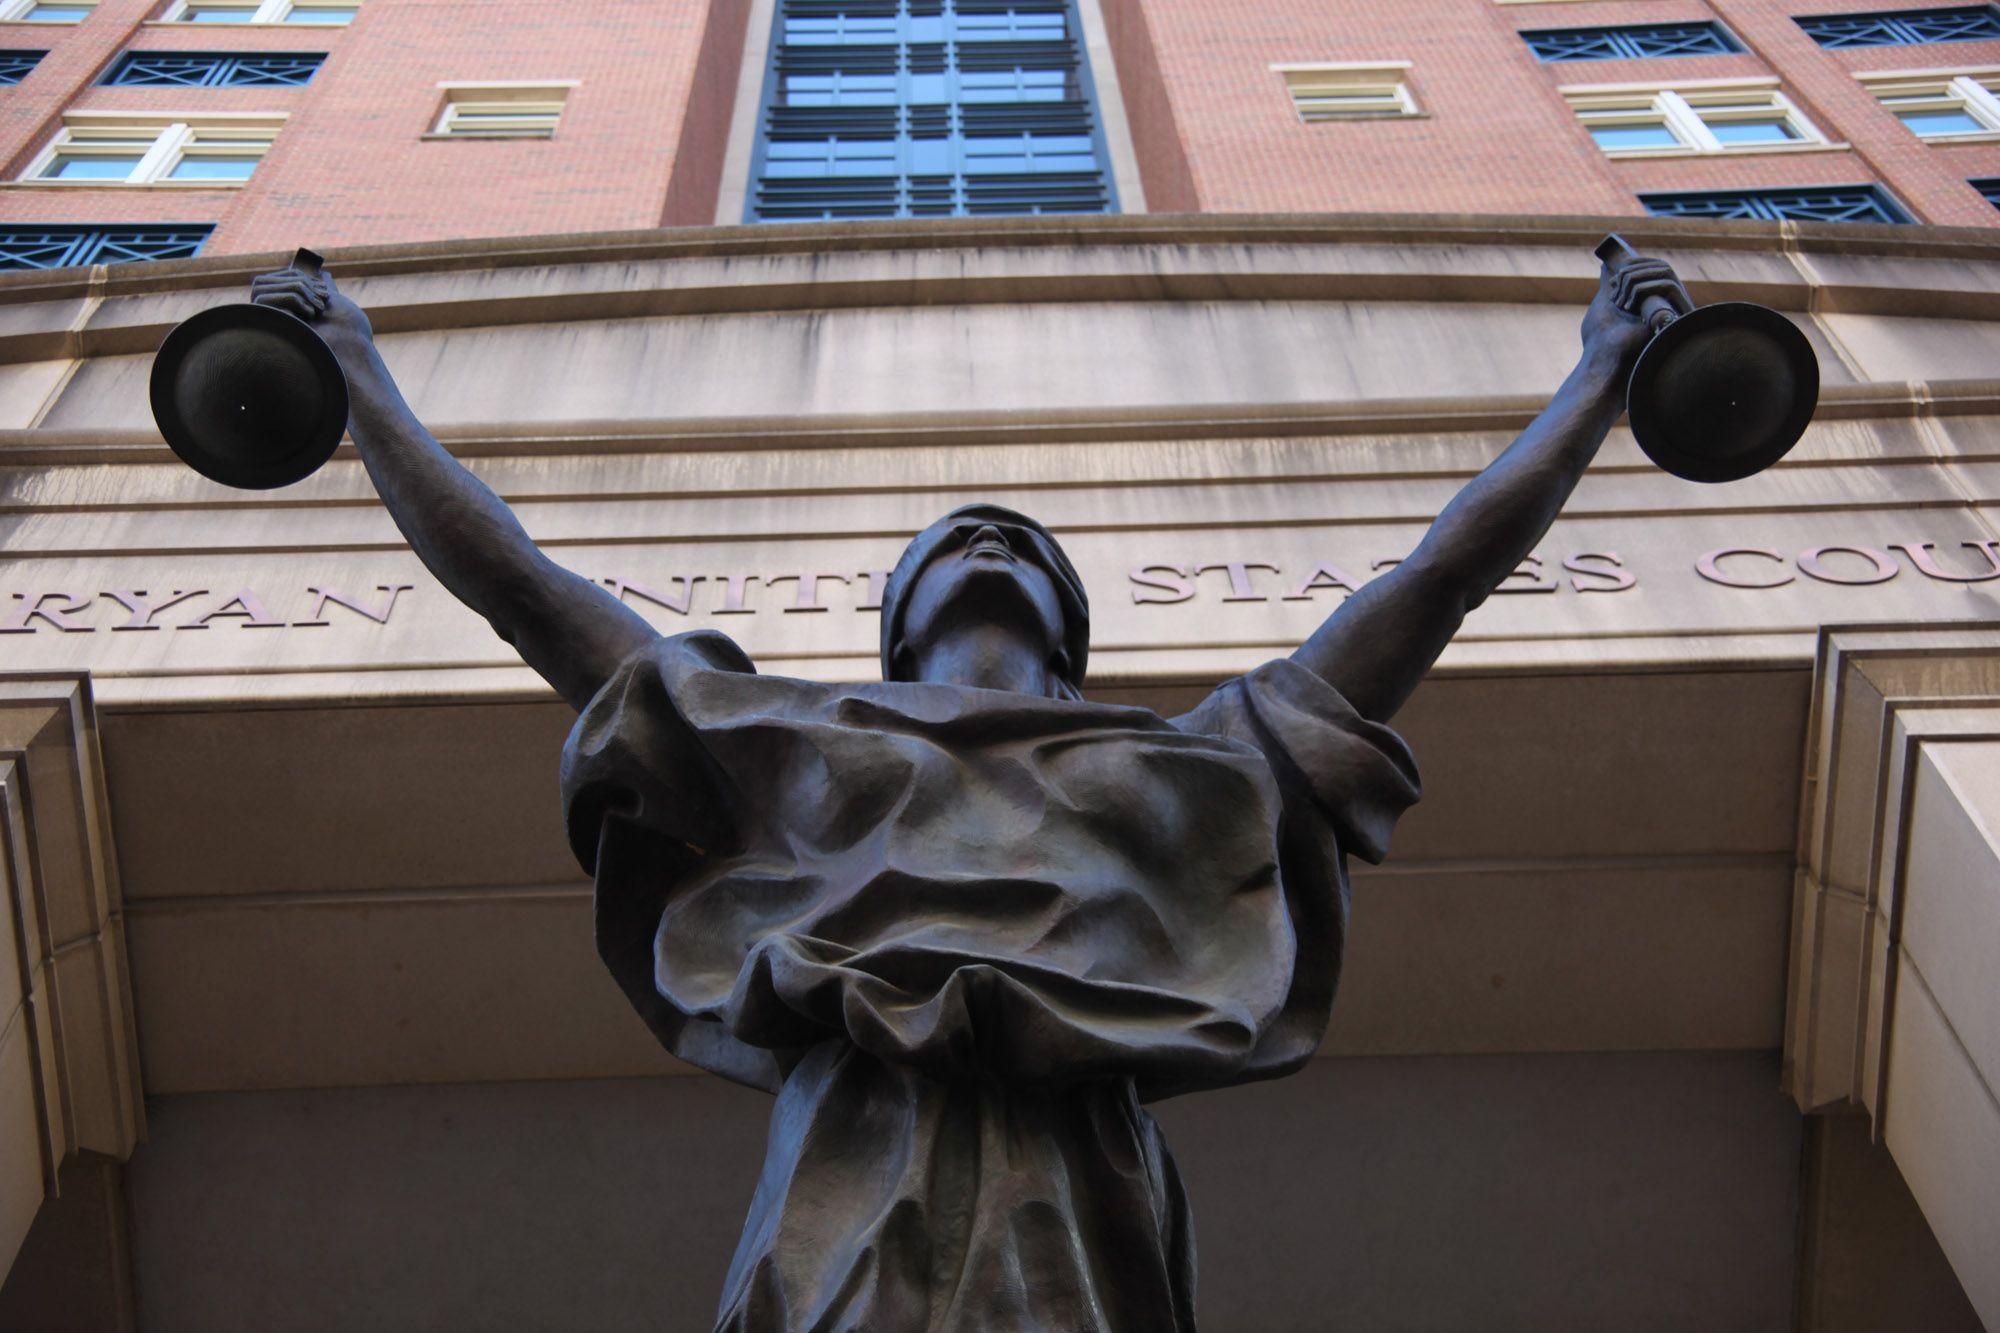 Albert_V_Bryan_Federal_District_Courthouse_-_Alexandria_Va_-_0018_-_2012-03-10